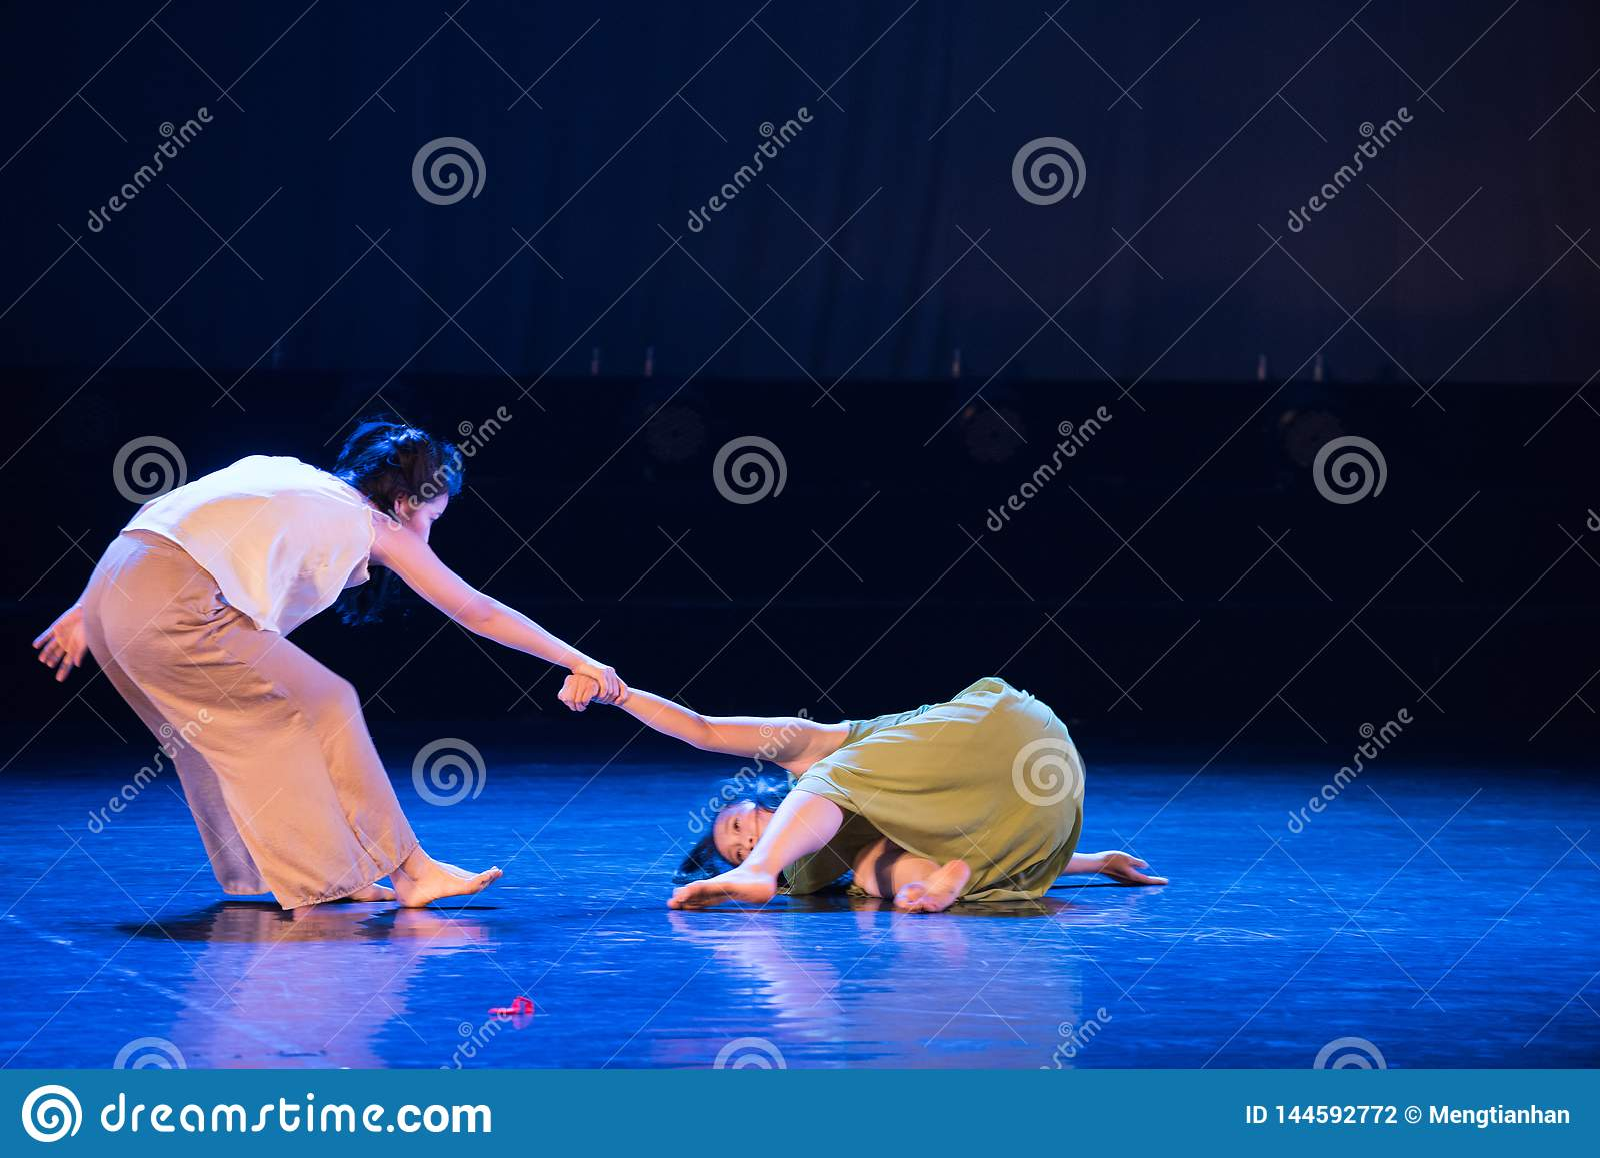 Sveglila su 4-Act 5: Nessuna parte per disporre ballo gioventù-moderno Dreamlan